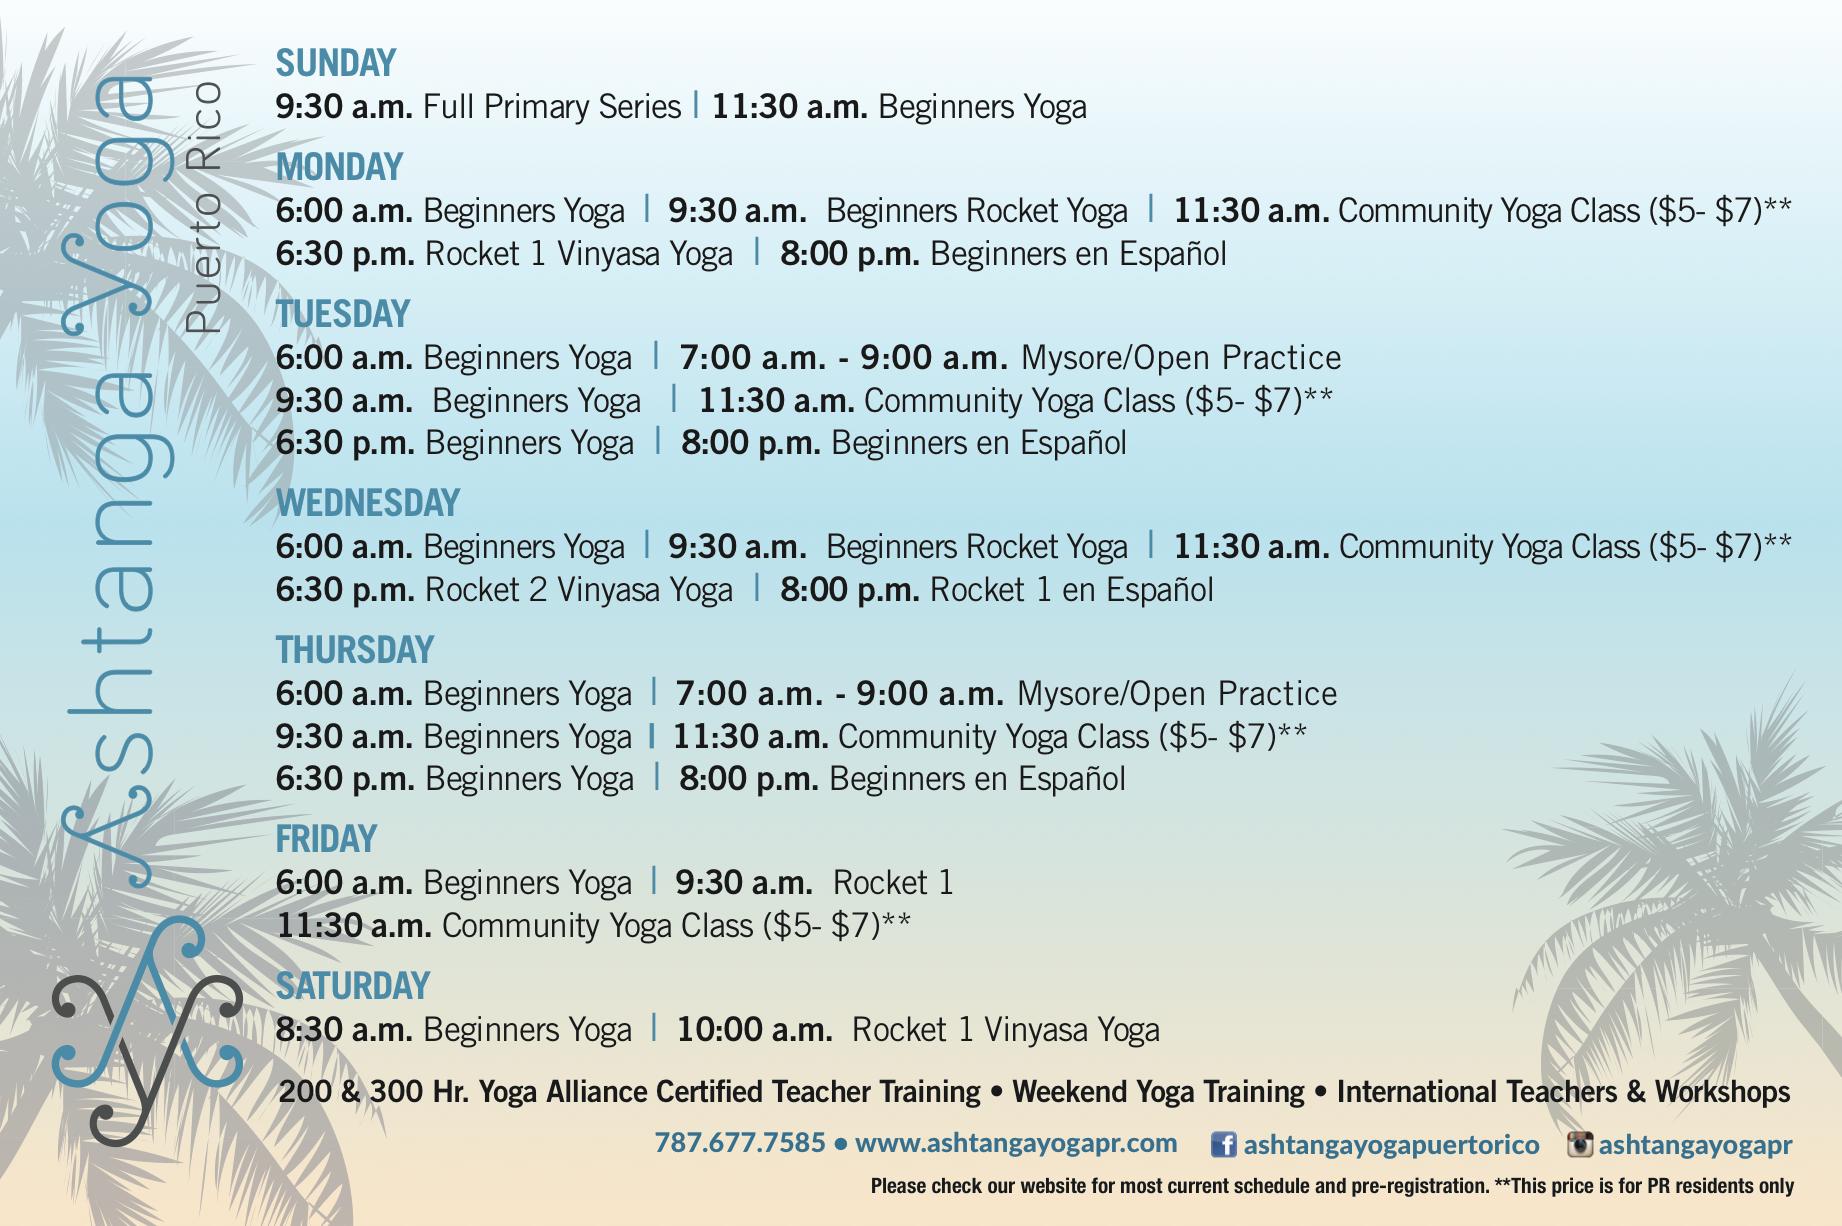 Programa Ashtanga Yoga 2017 Lado B